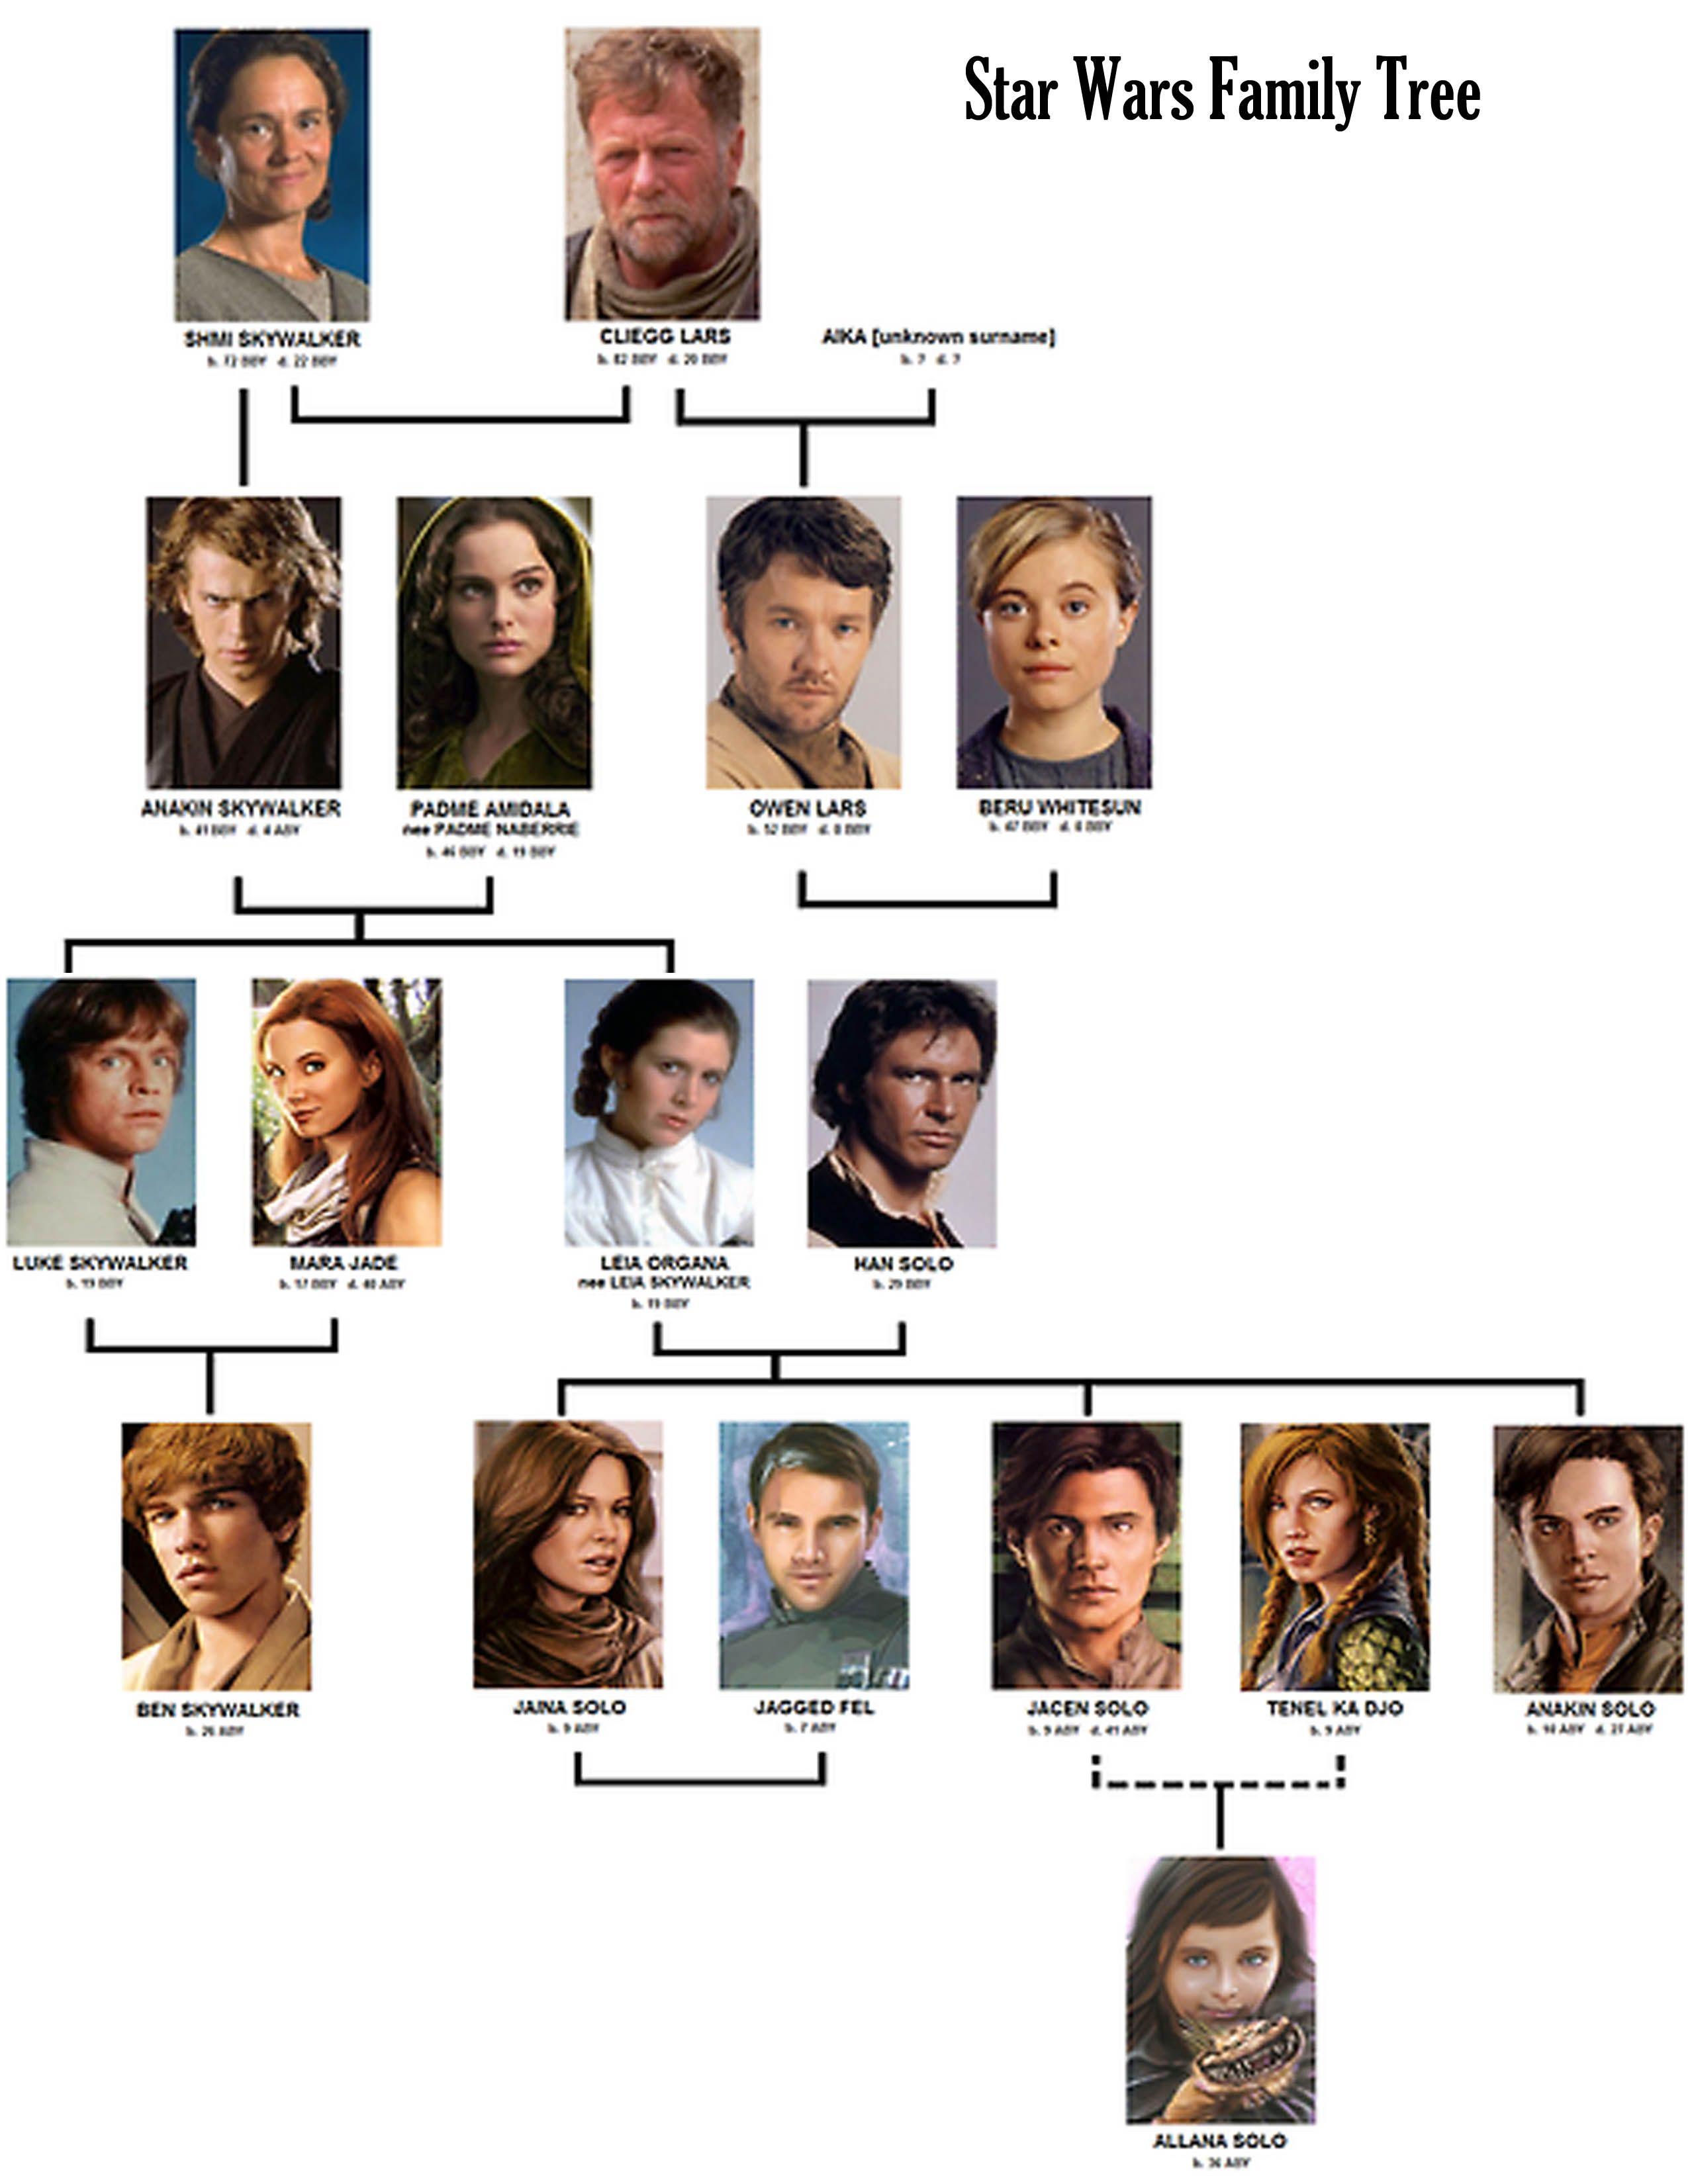 Skywalker family tree source club jade star wars for Arbol genealogico star wars